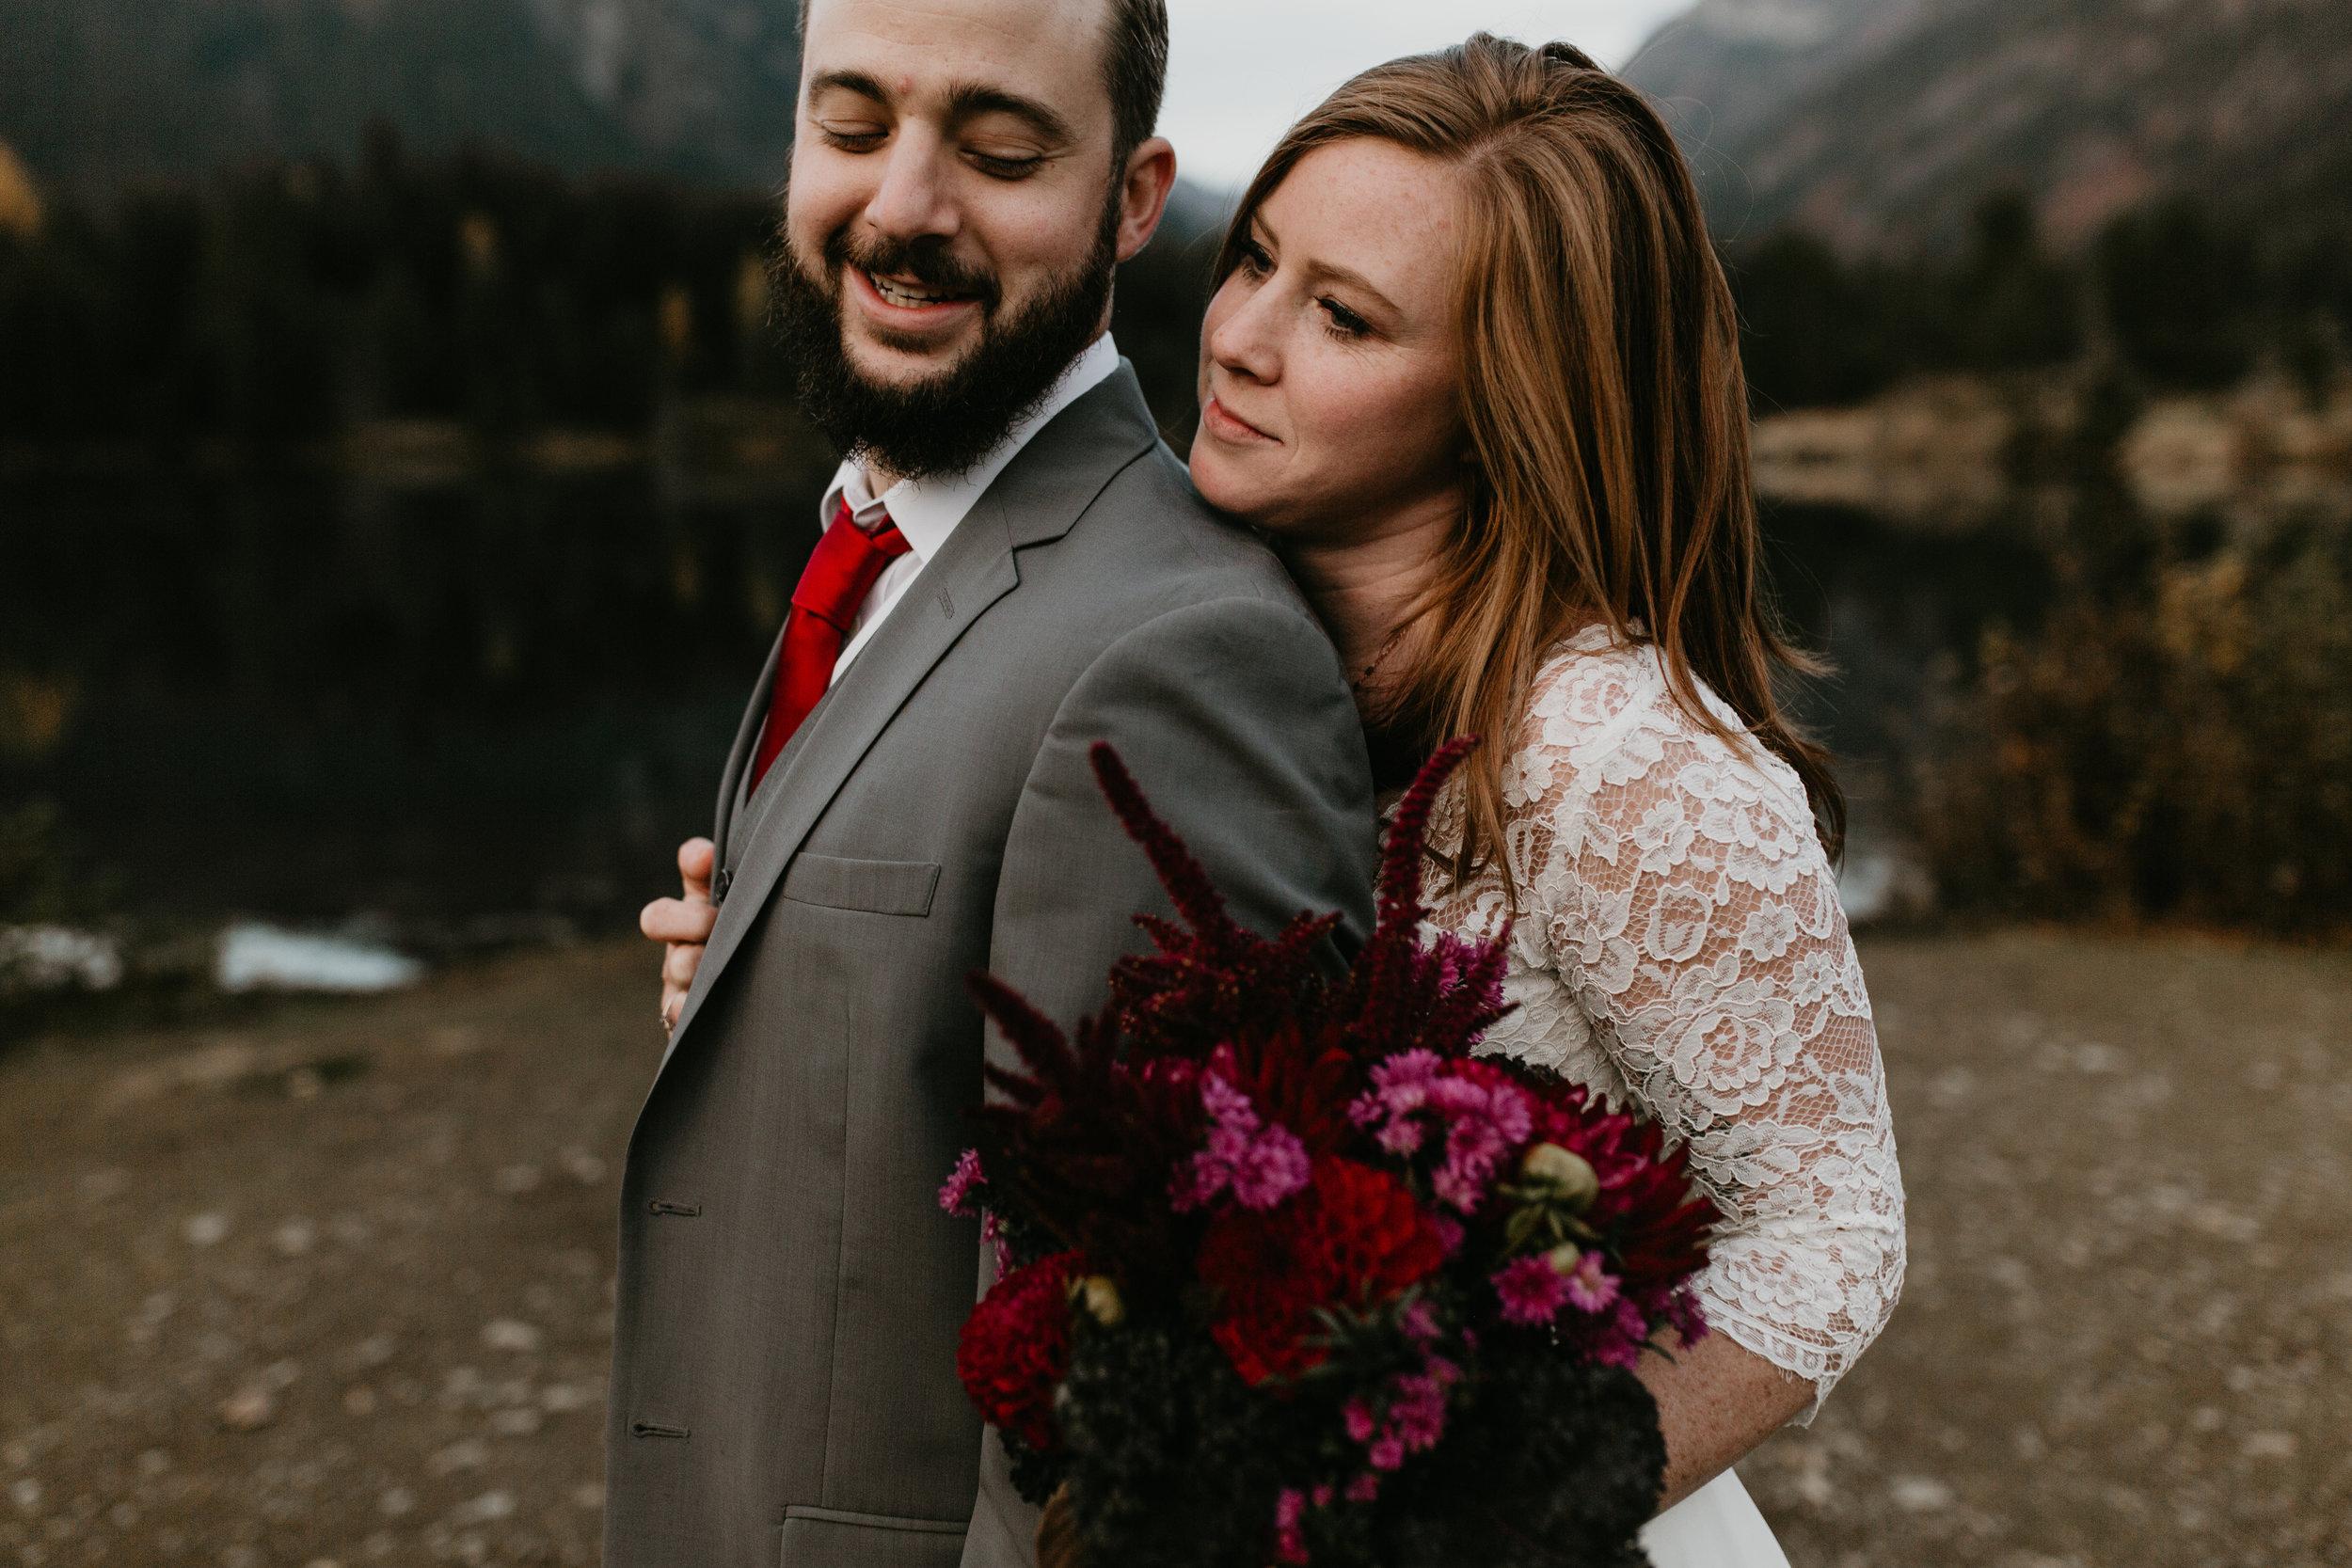 nicole-daacke-photography-mountain-view-elopement-at-gold-creek-pond-snoqualmie-washington-wa-elopement-photographer-photography-adventure-elopement-in-washington-fall-lakeside-golden-sunset-boho-fun-bride-0578.jpg